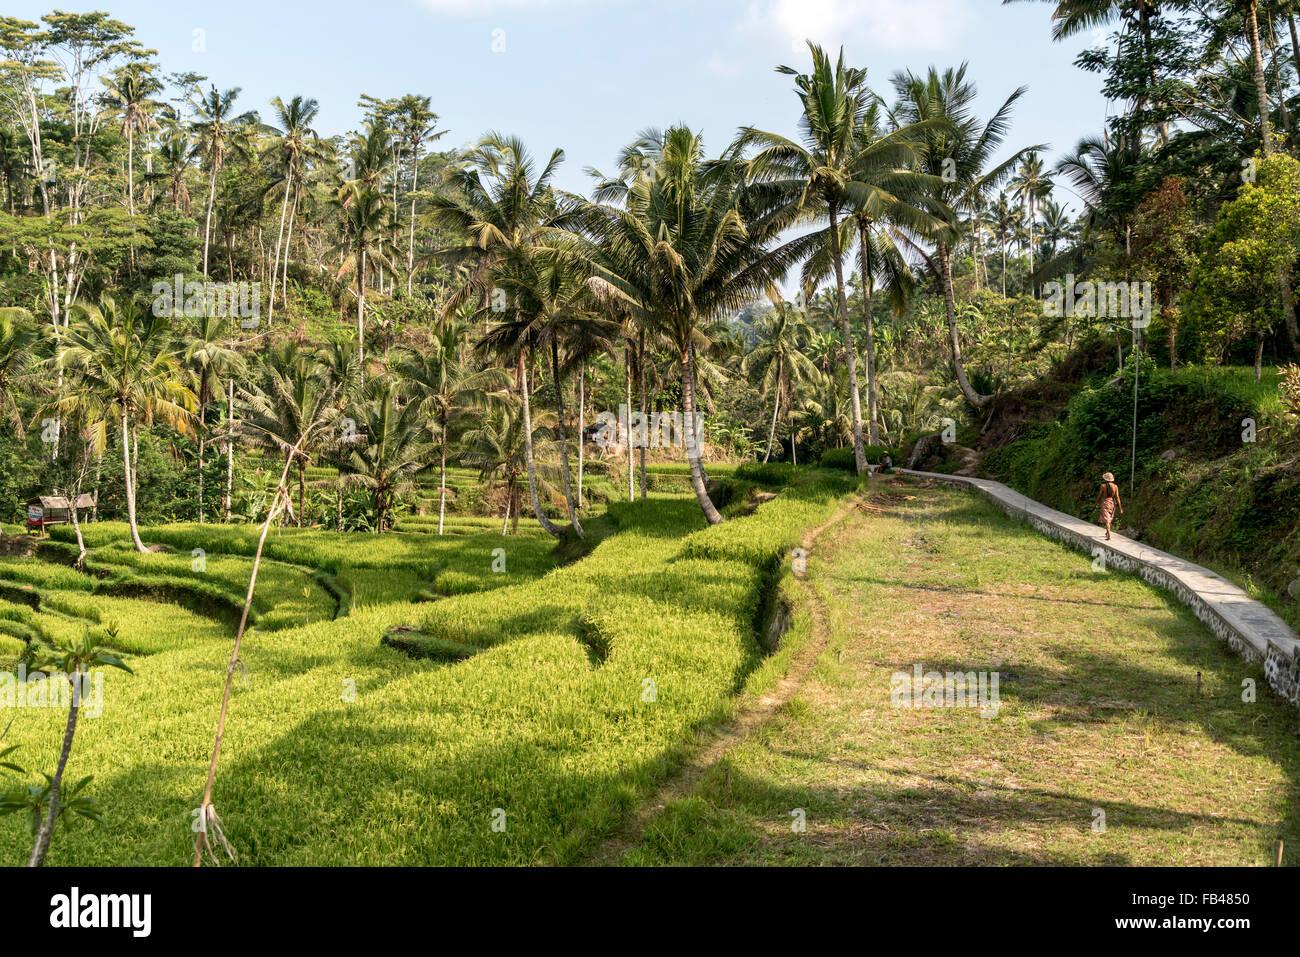 Terrasses de riz au Temple de Gunung Kawi, près de Tampaksiring Ubud, Bali, Indonésie Photo Stock